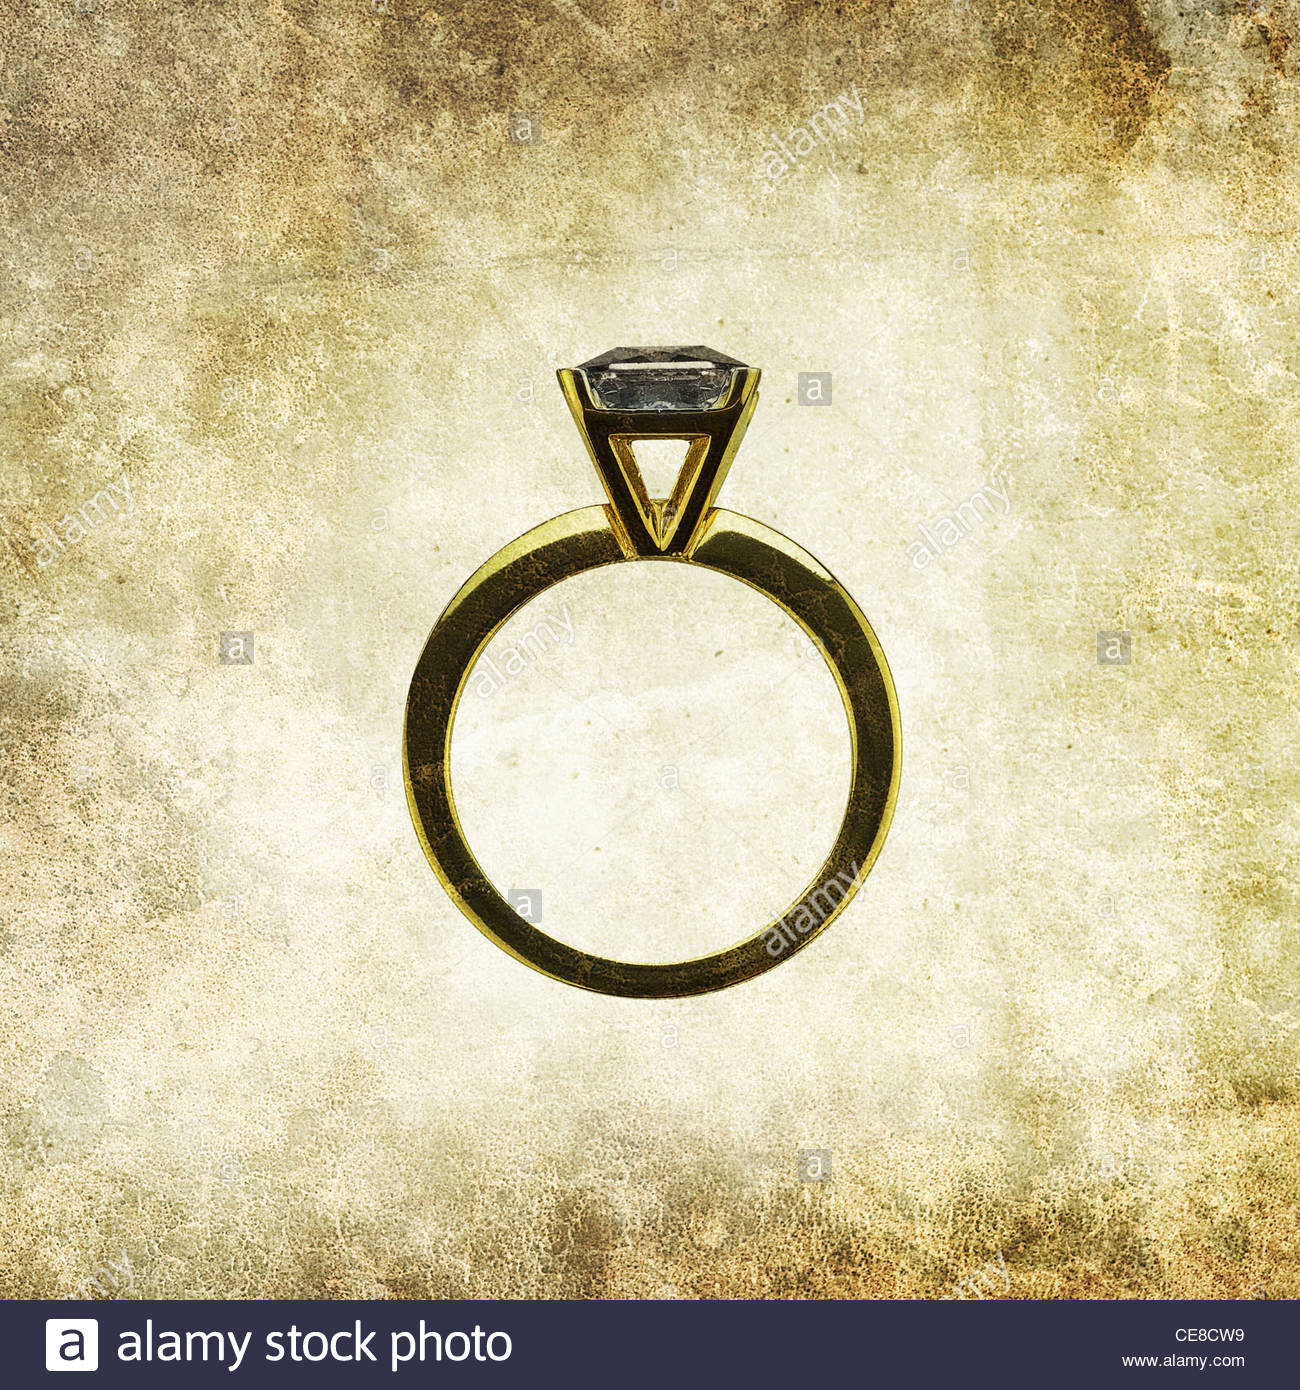 antique wedding ring - Stock Image